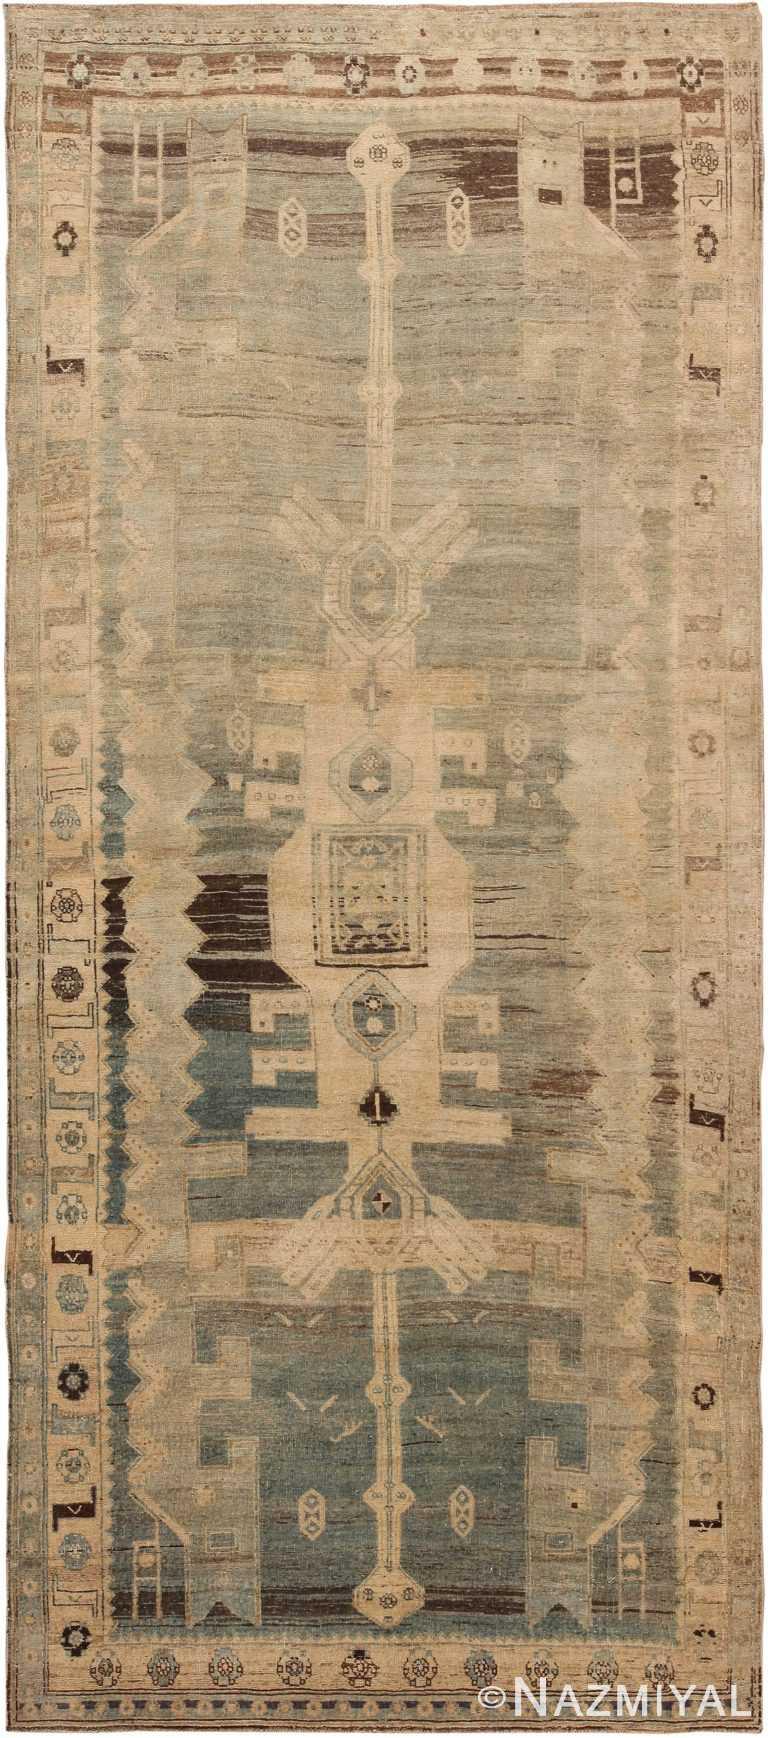 Antique Persian Bidjar Runner Rug 60526 by Nazmiyal Antique Rugs